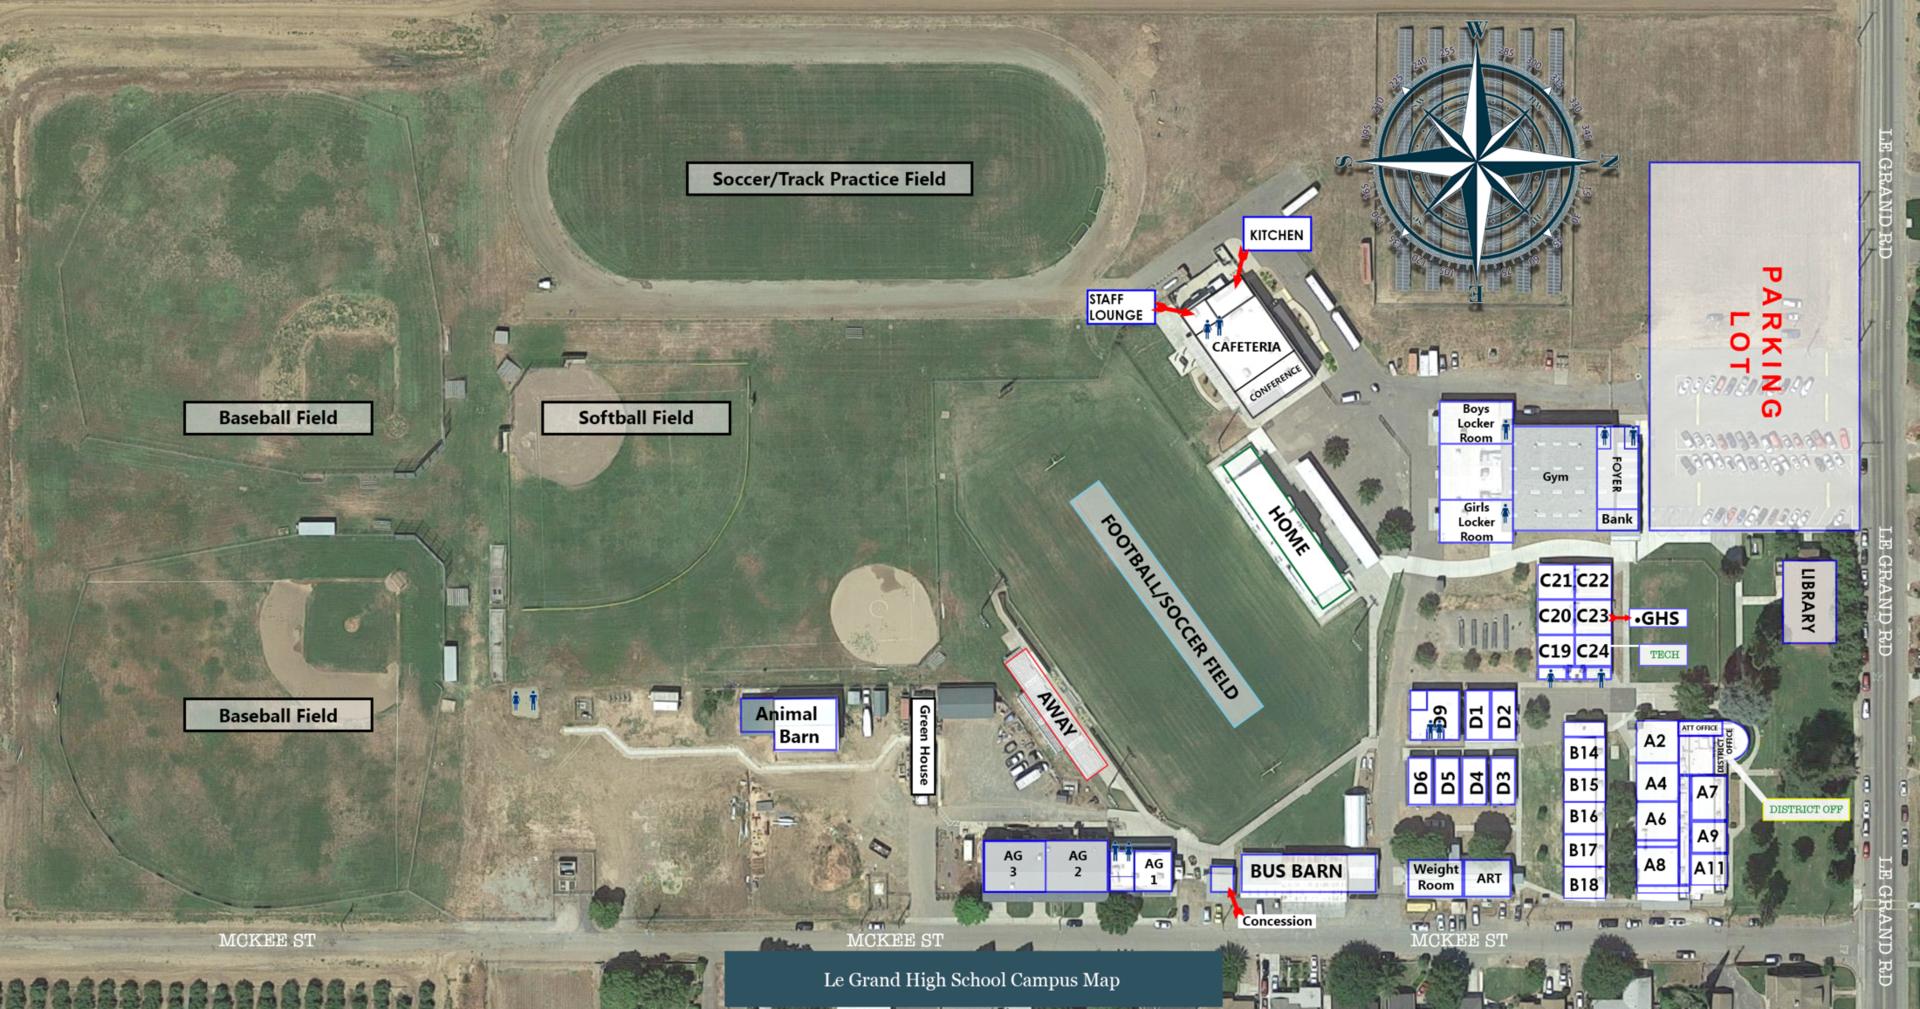 Le Grand High School Campus Map